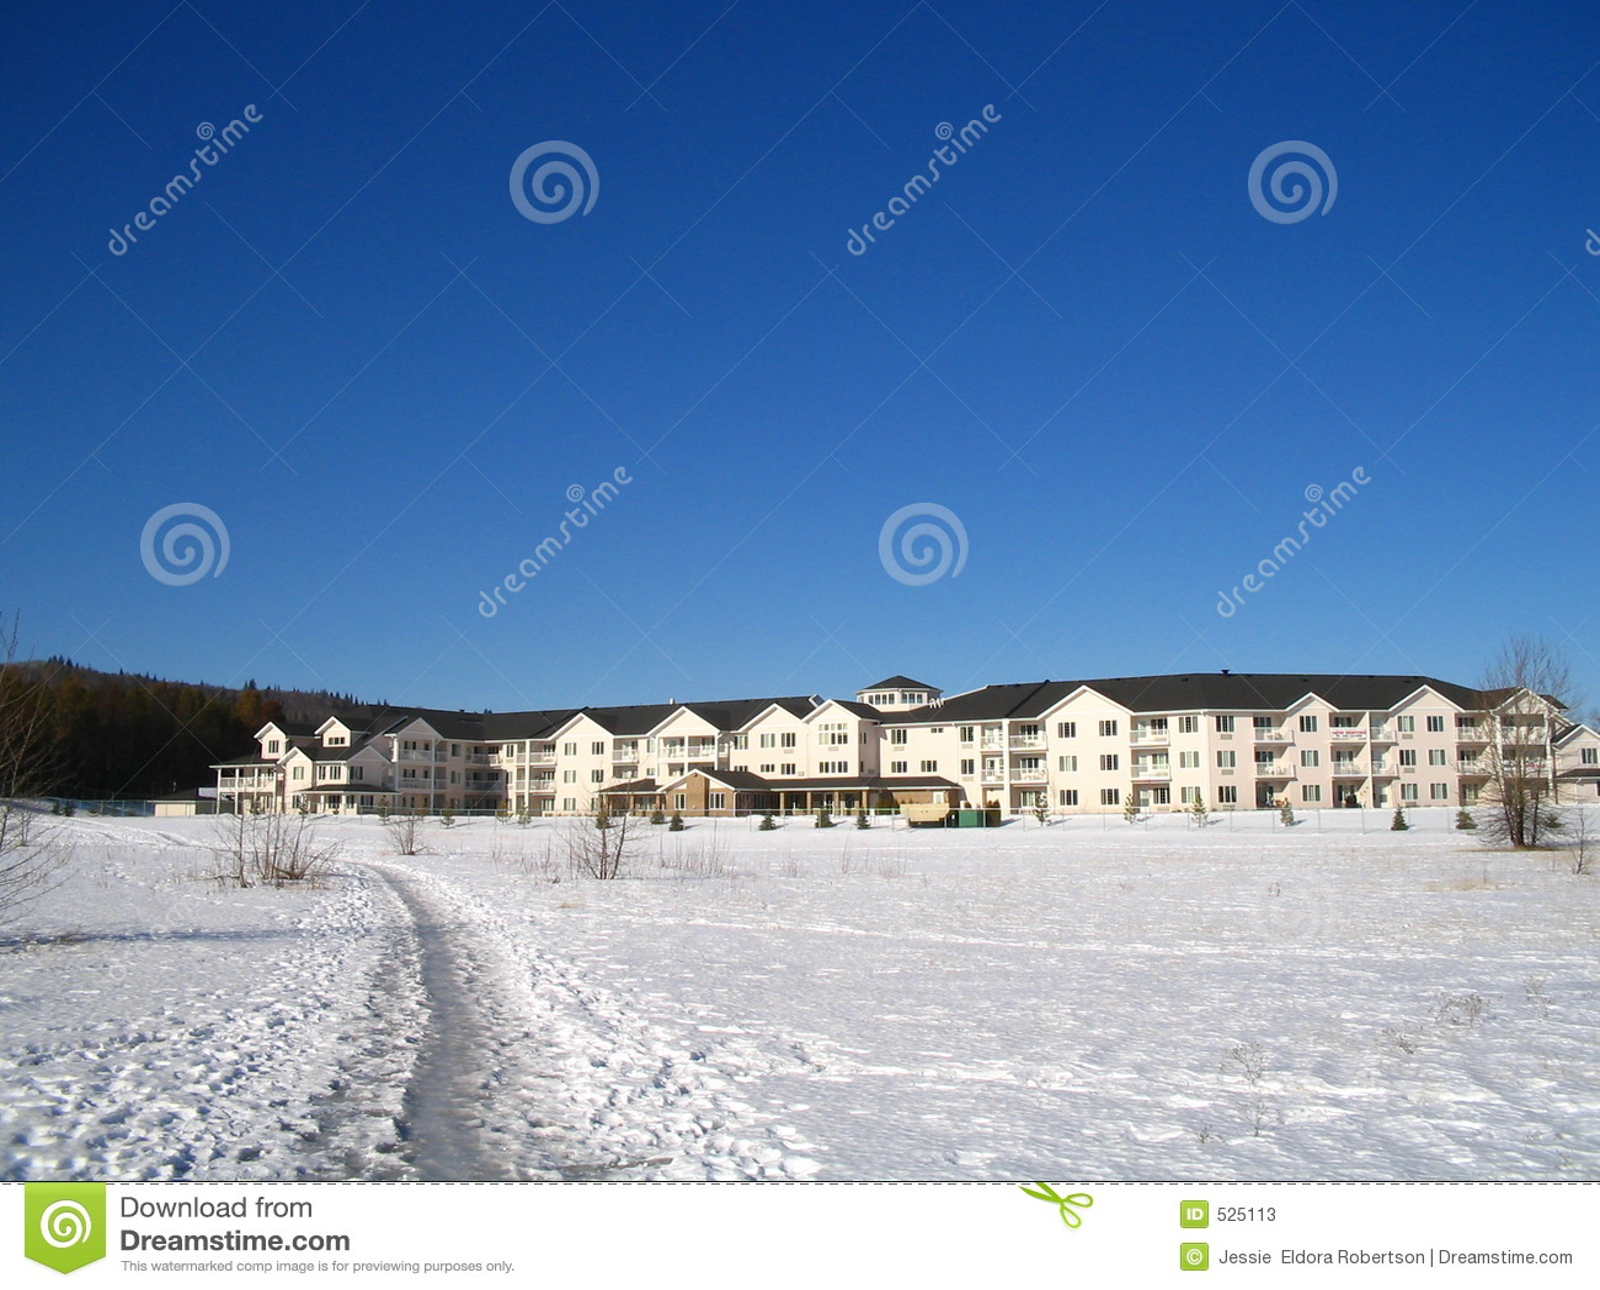 Download 复杂住房前辈 库存图片. 图片 包括有 冷漠, 降雪, 行业, 国家(地区), 多层, 最近, 农村, 冬天 - 525113